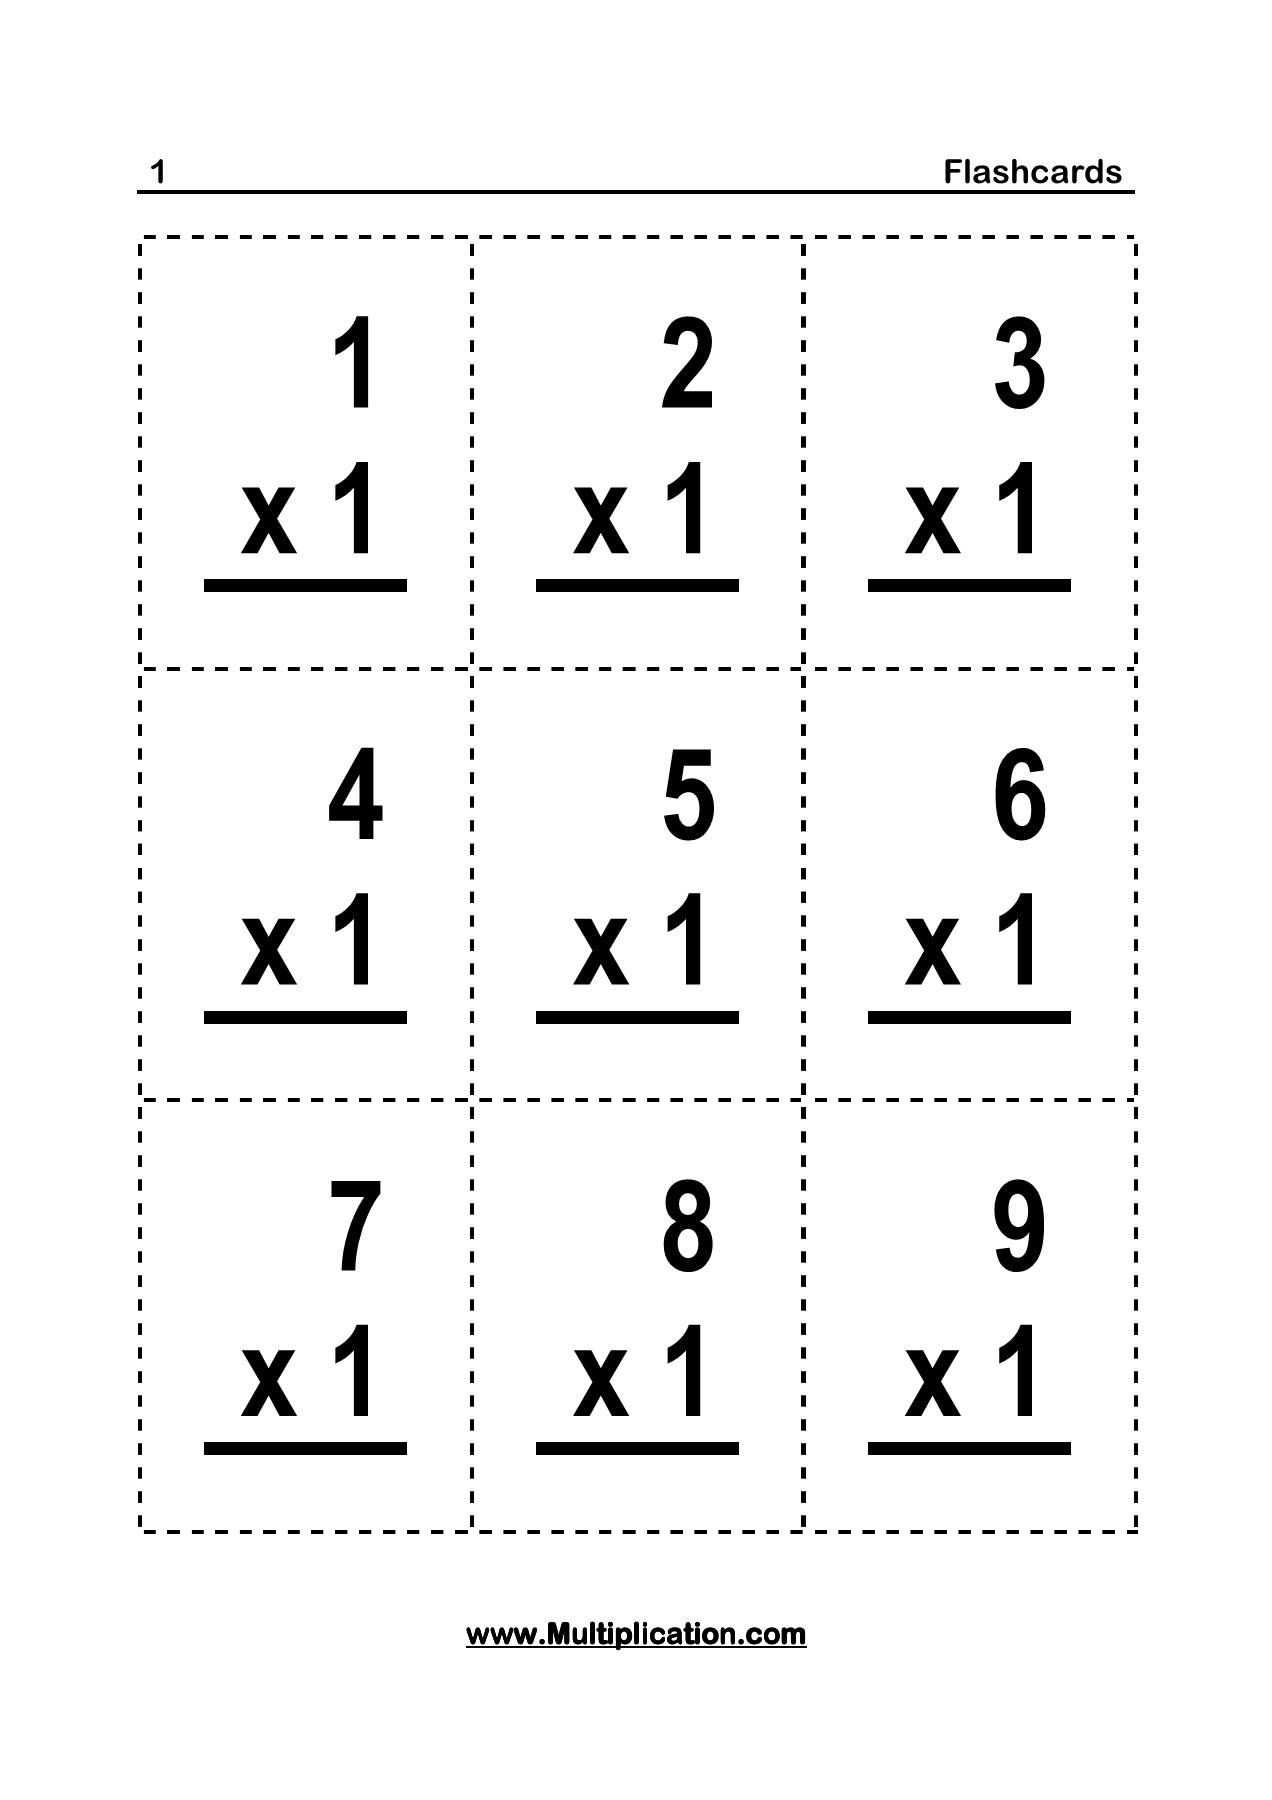 Flashcards - 0 - Multiplication